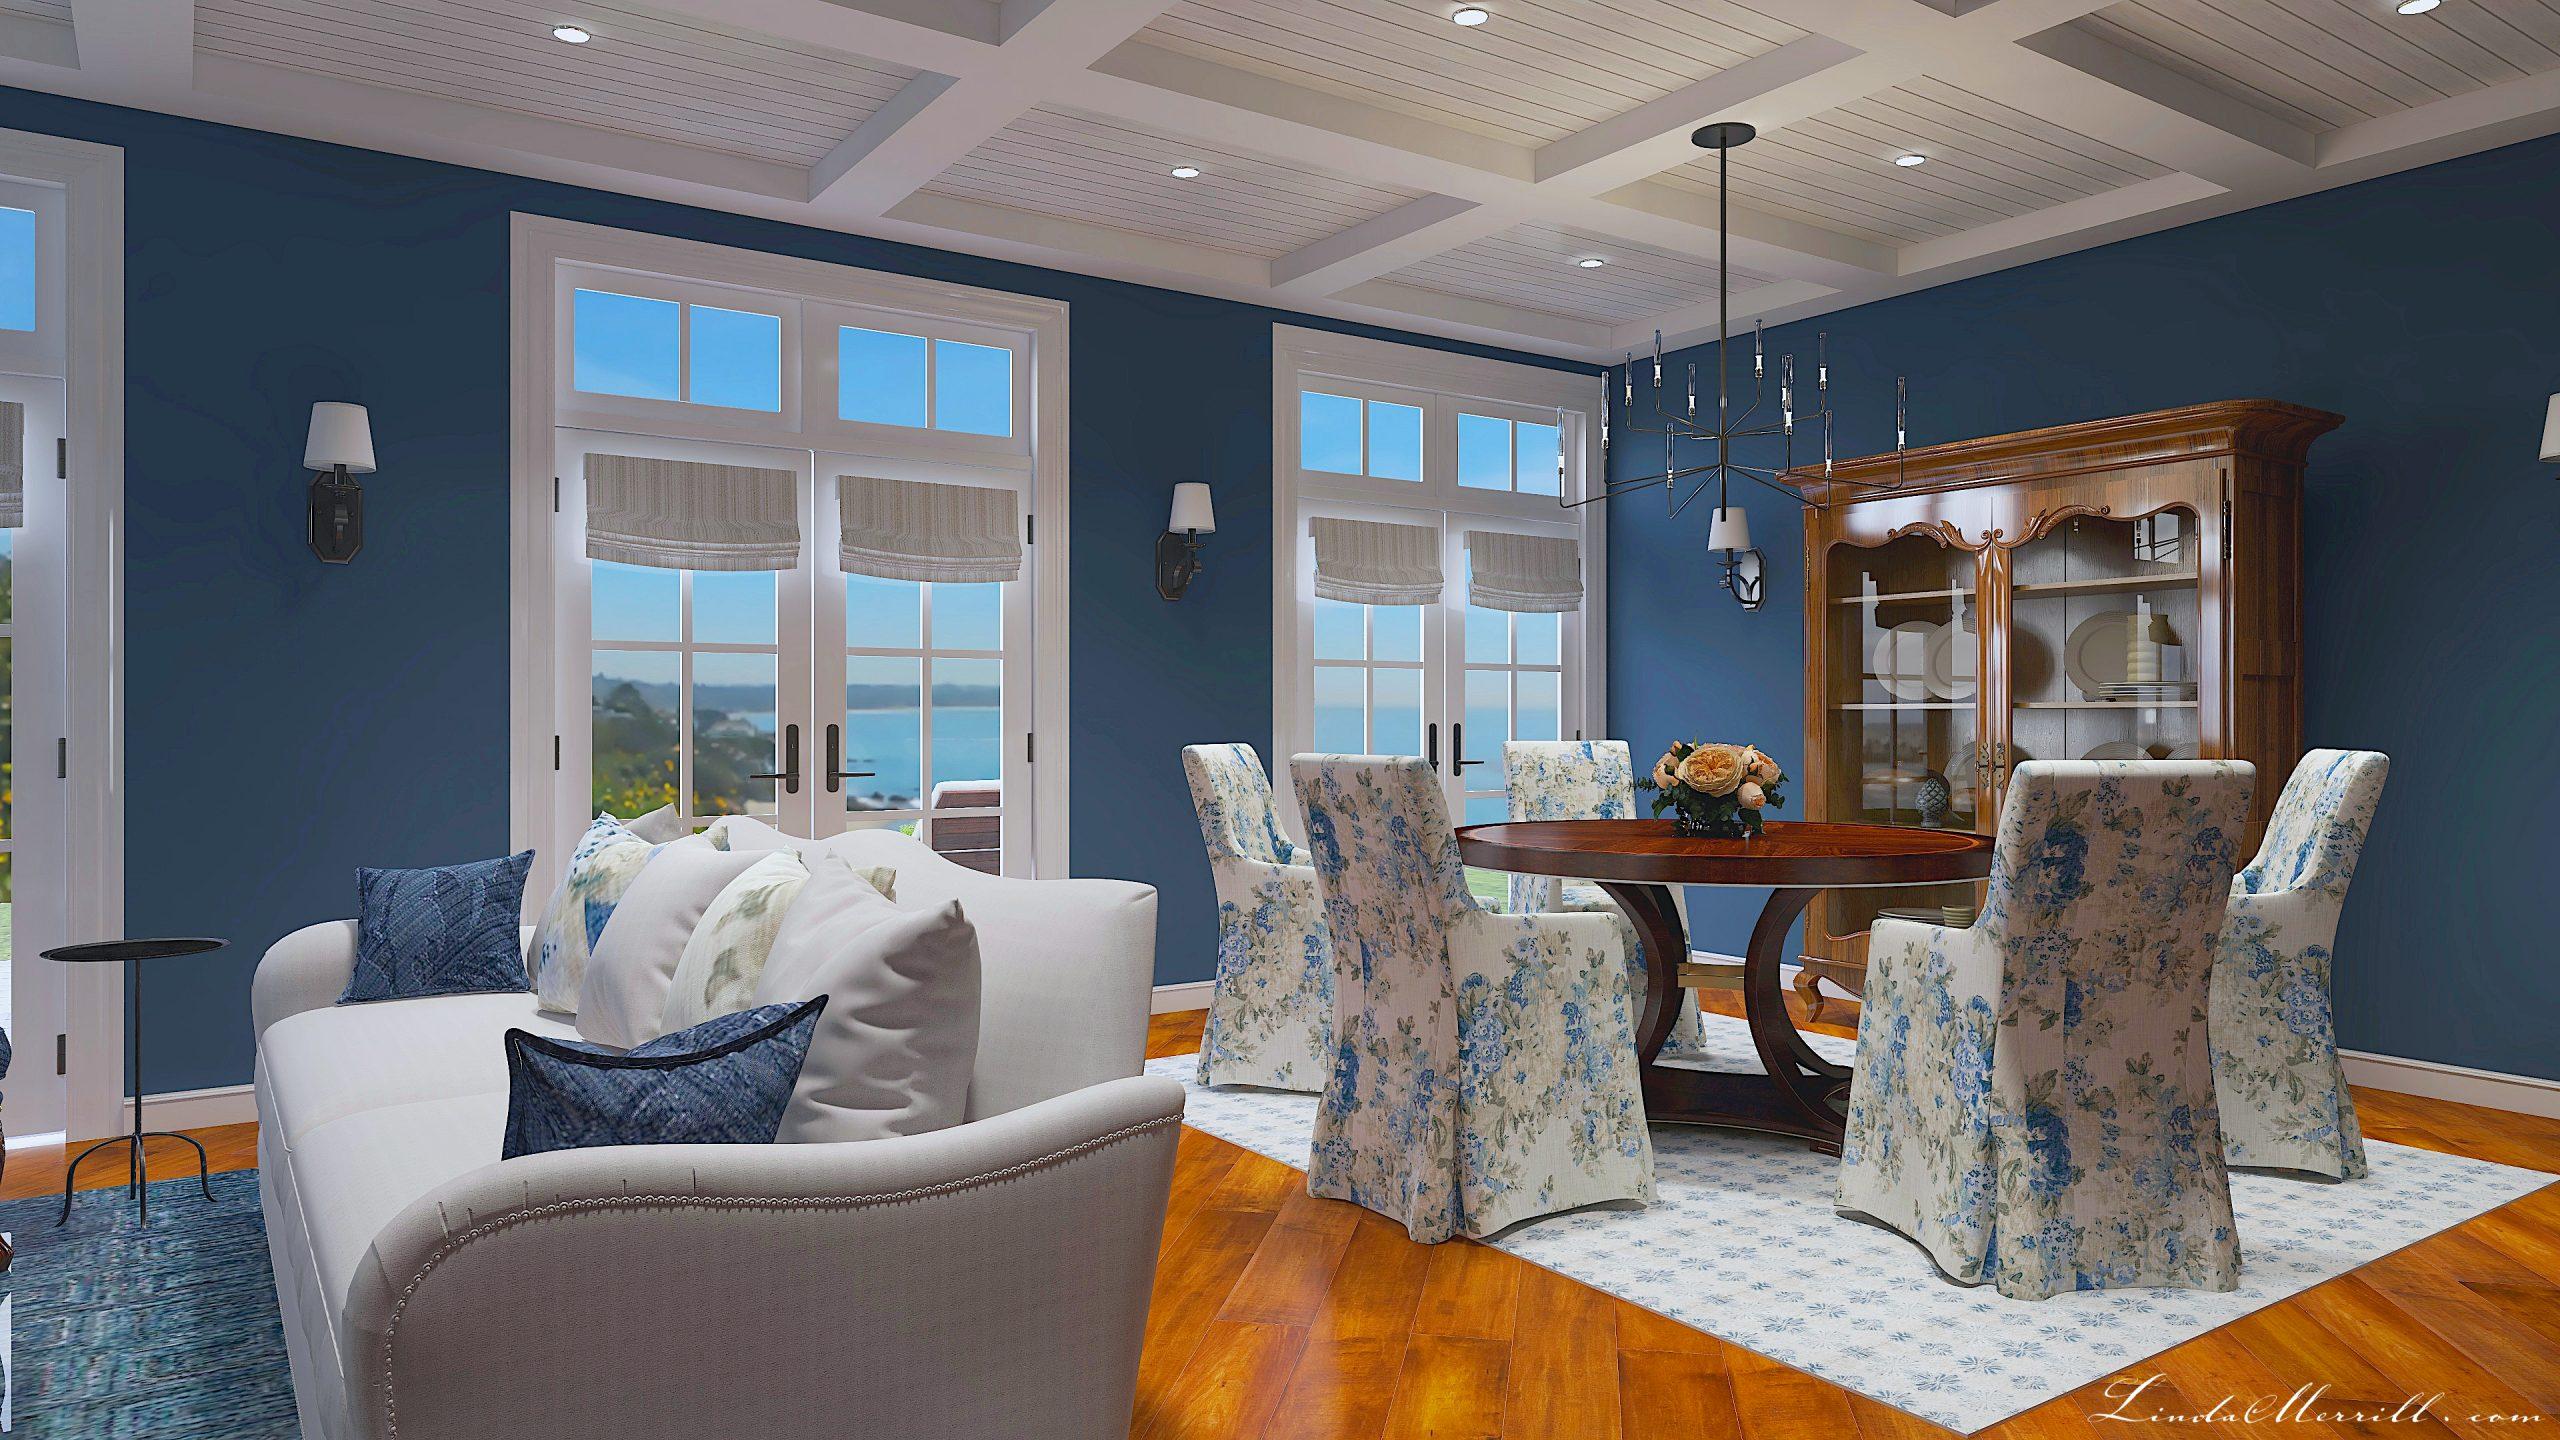 Linda Merrill Design New England interior design beacy coastal